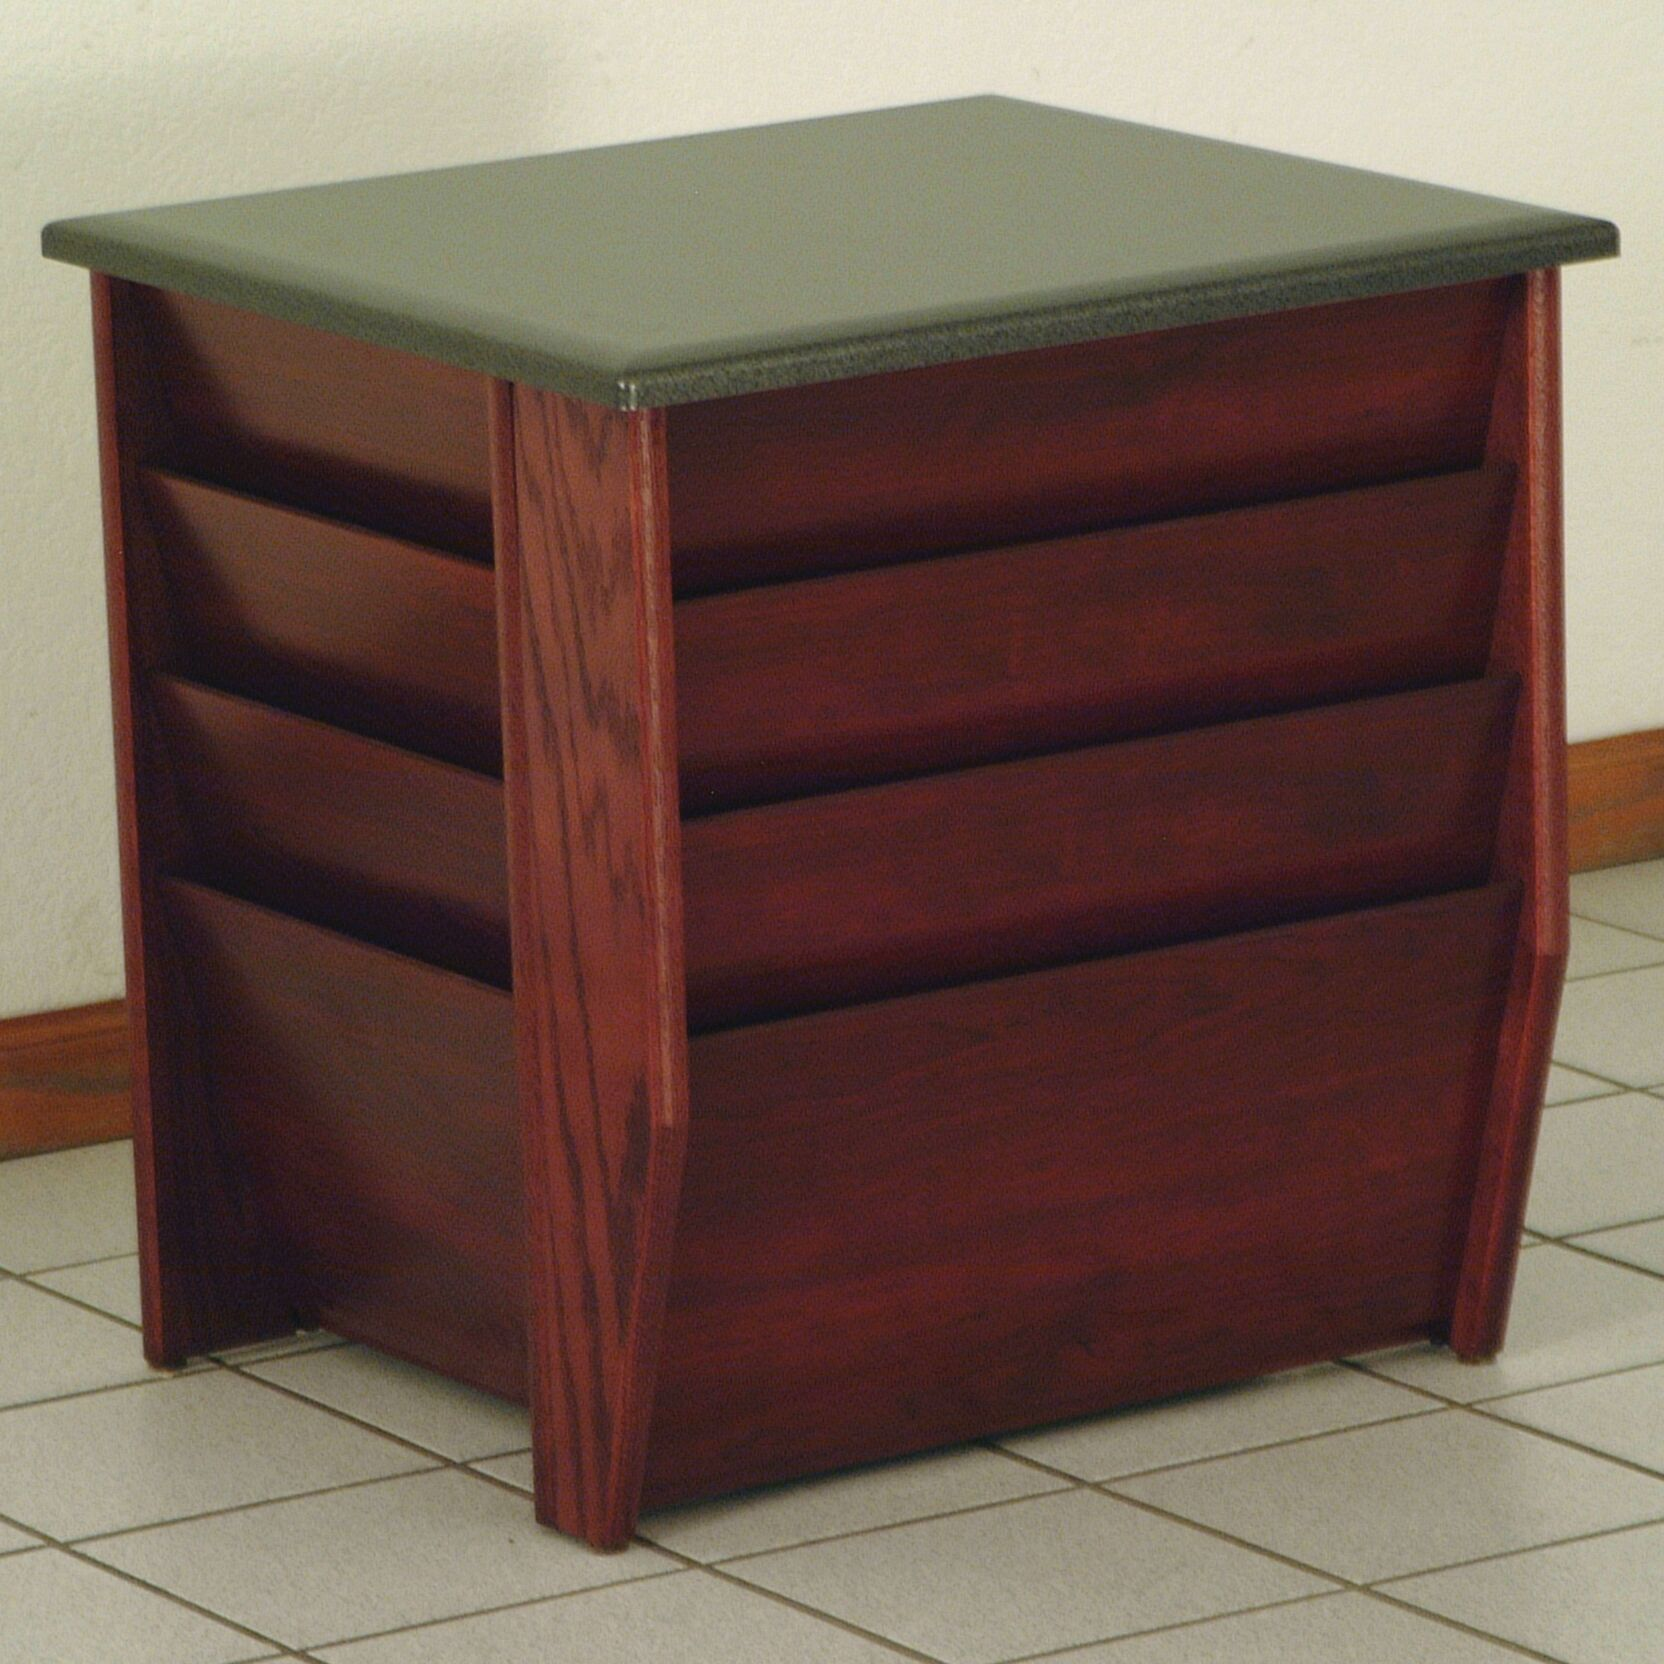 Dakota Wave End Table with Magazine Pockets Color: Dark Red Mahogany